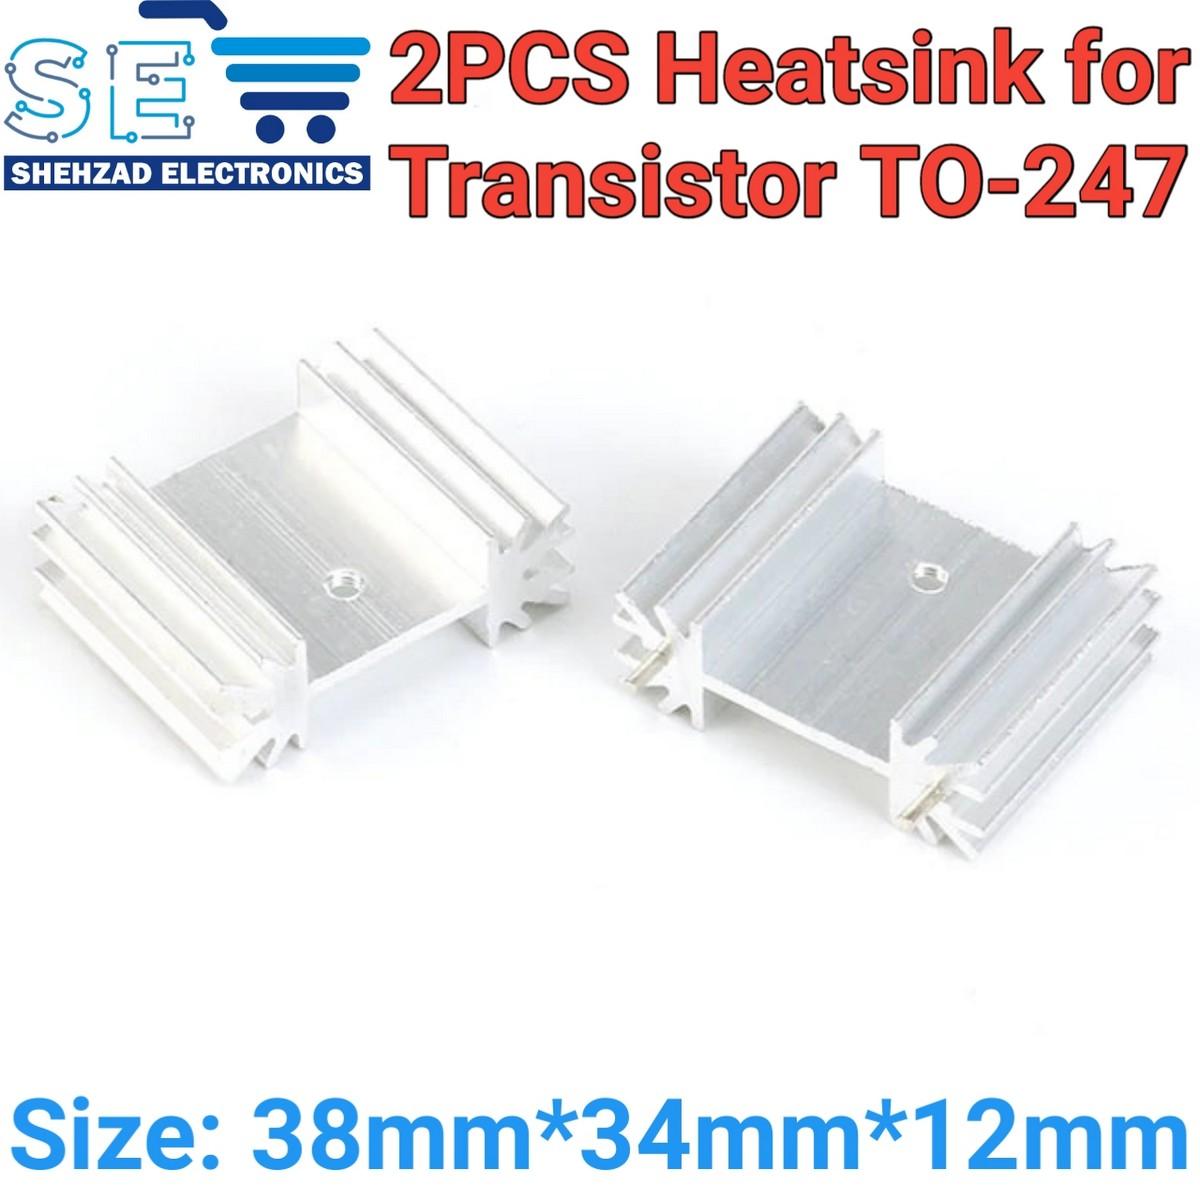 2PCS Aluminium TO-247 Heatsink Heat Sink for Transistor